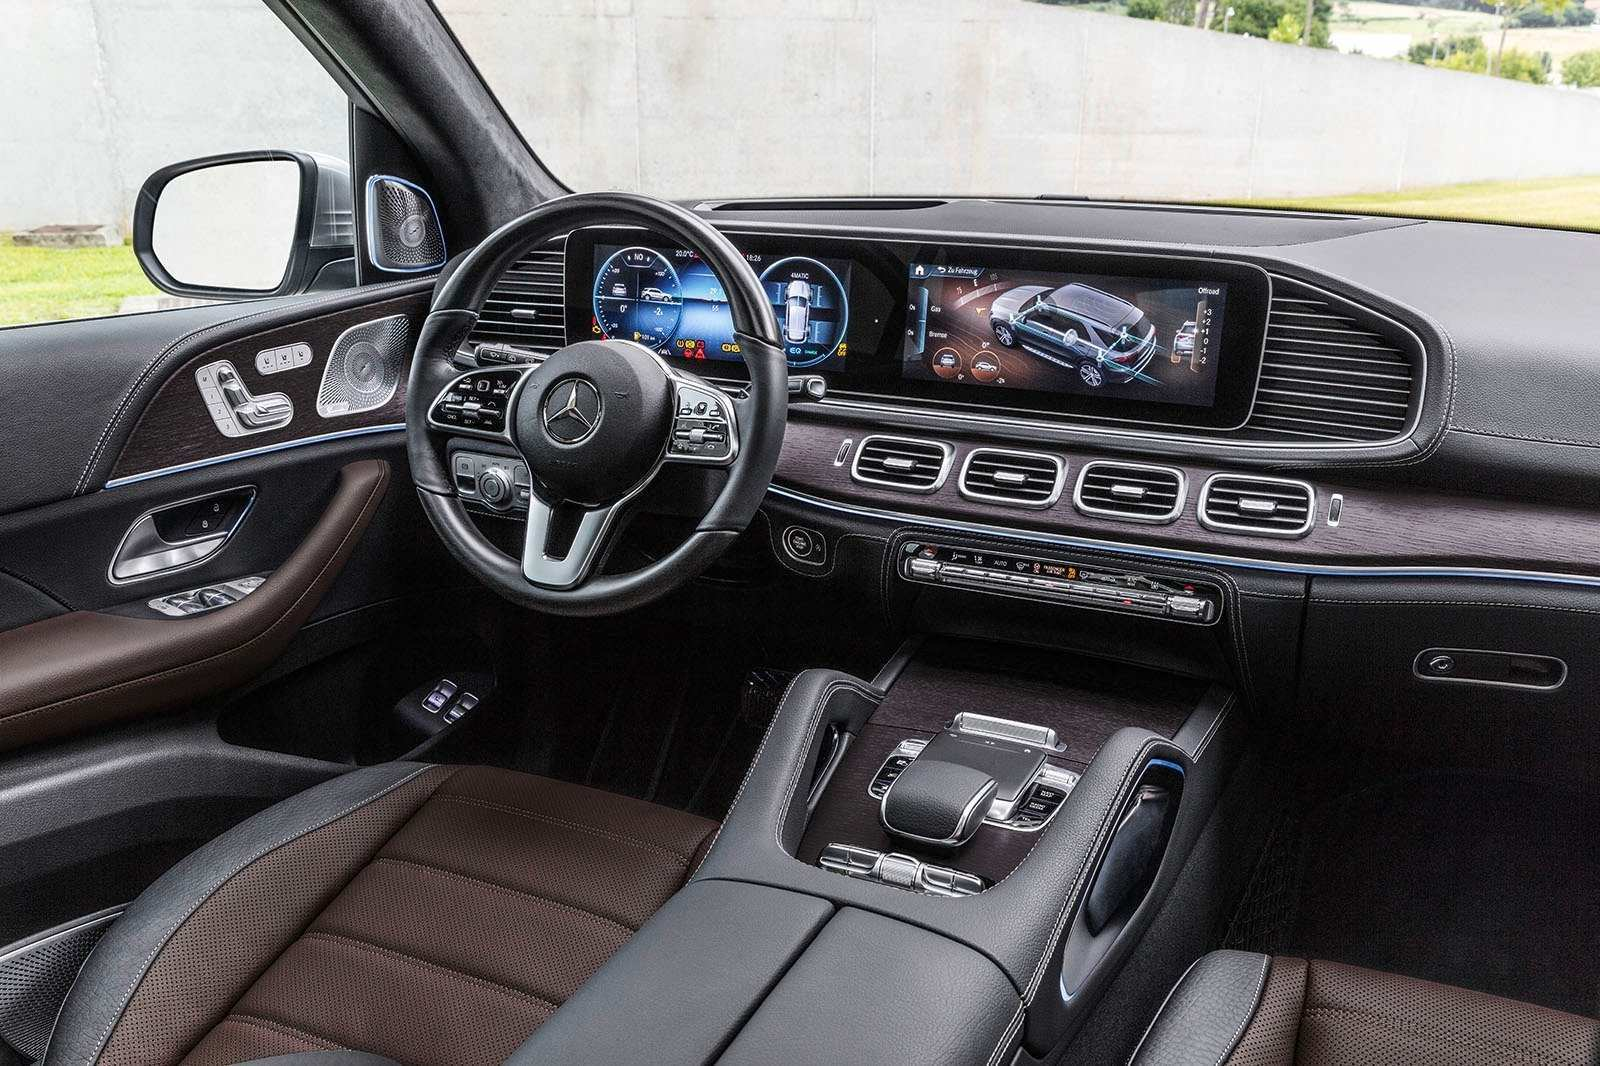 46 Great Mercedes B Class 2020 New Review by Mercedes B Class 2020